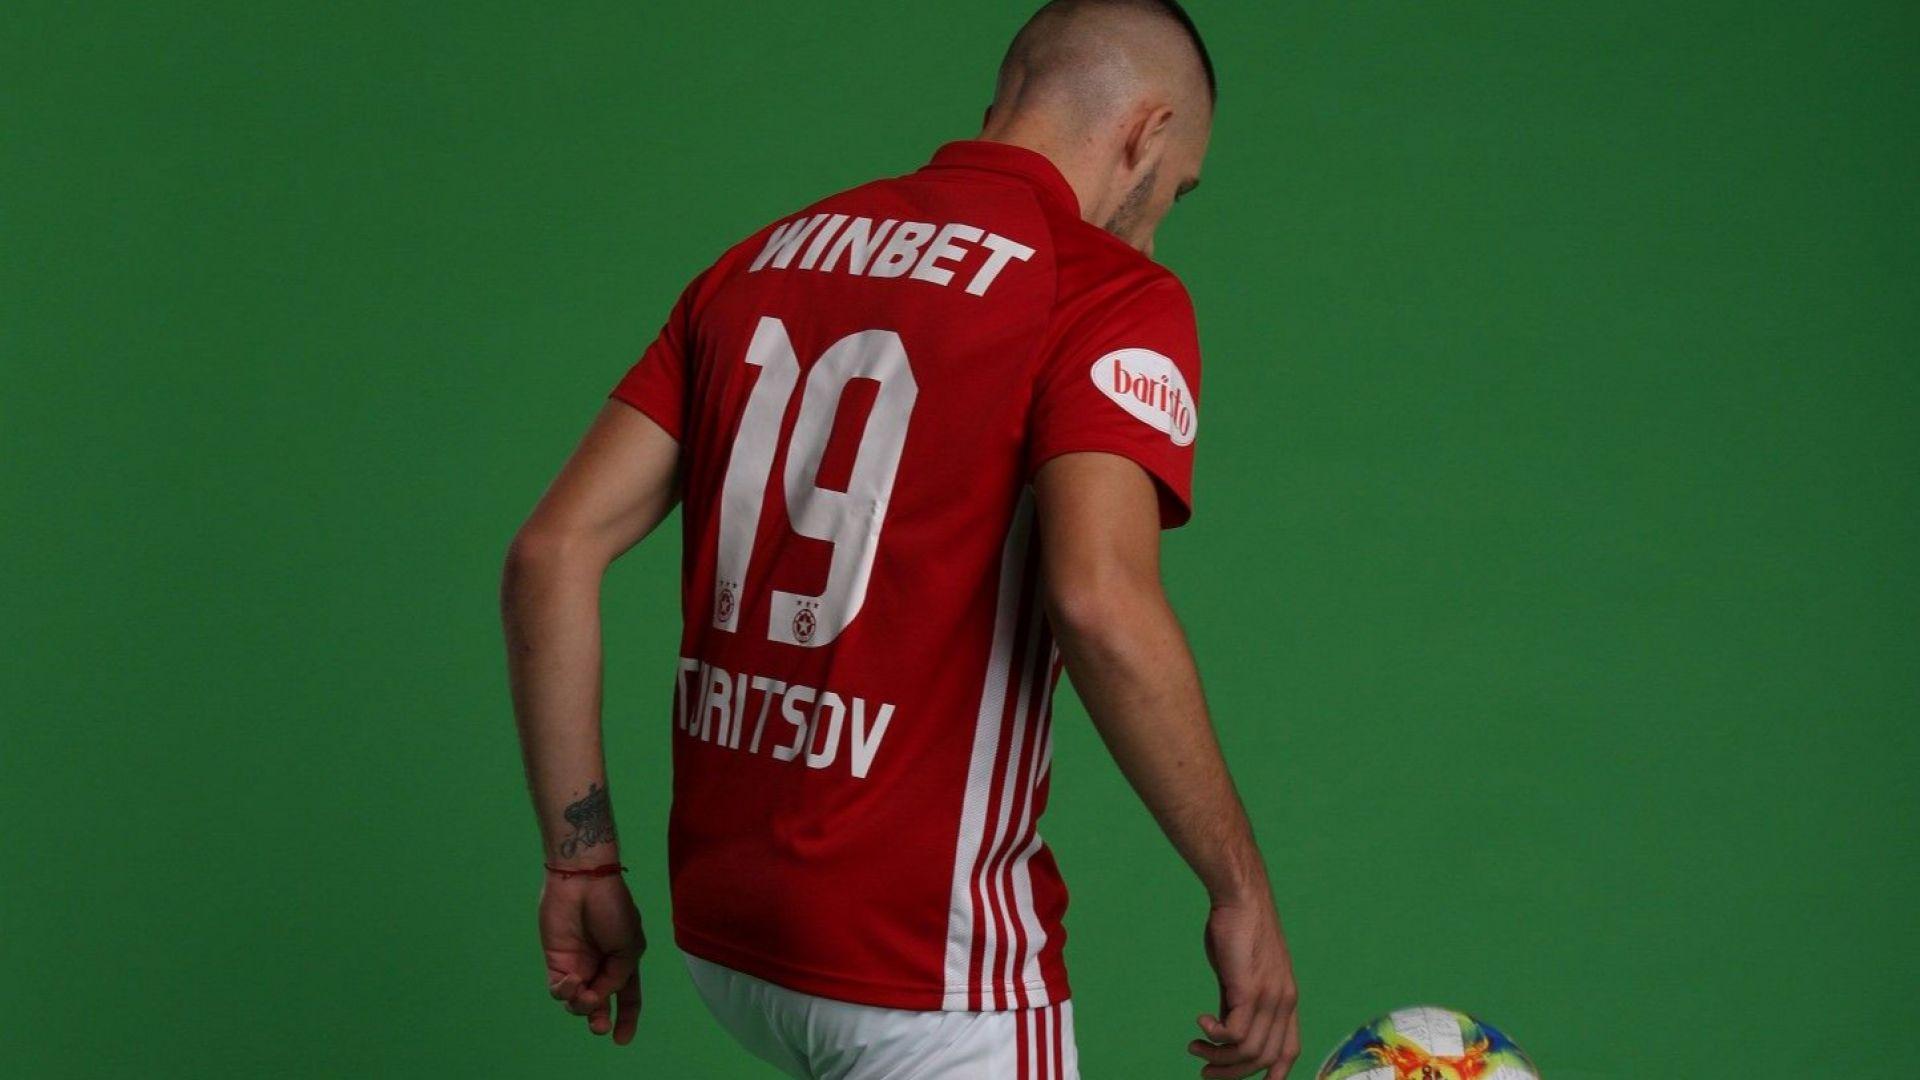 Иван Турицов пред Winbet: Ще победим Ботев с 2:0